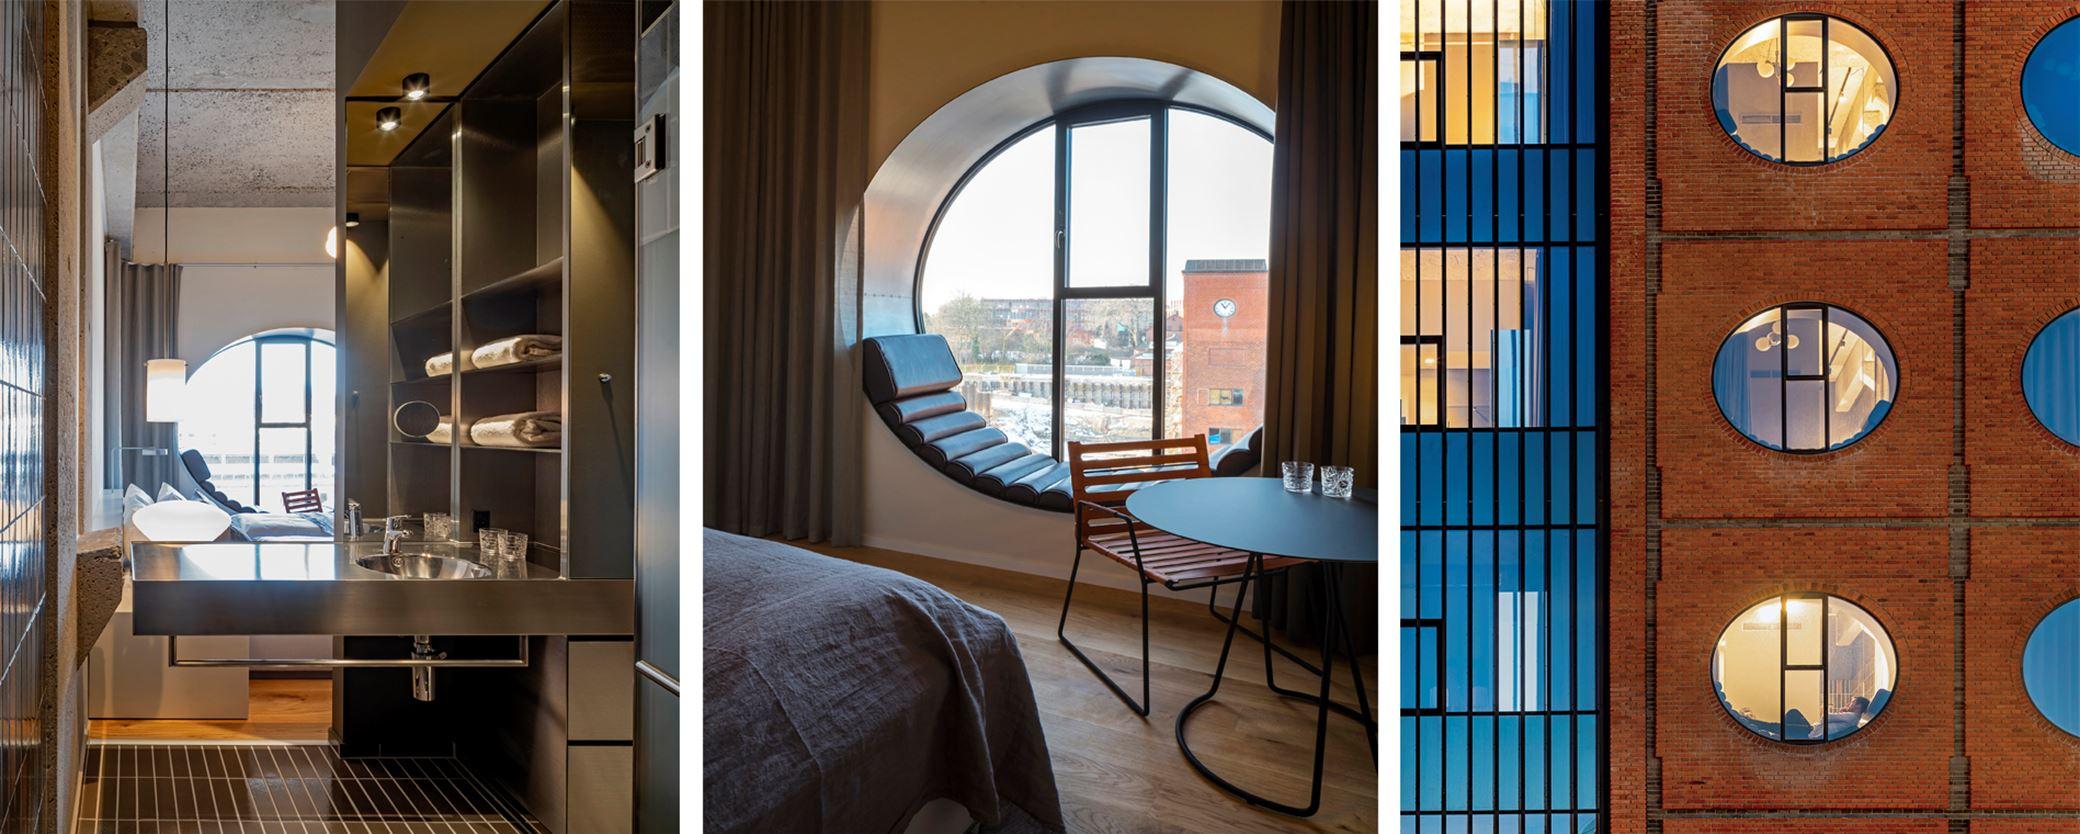 Hotel-Ottilia-Arkitema-Architects-incontournables-Copenhague